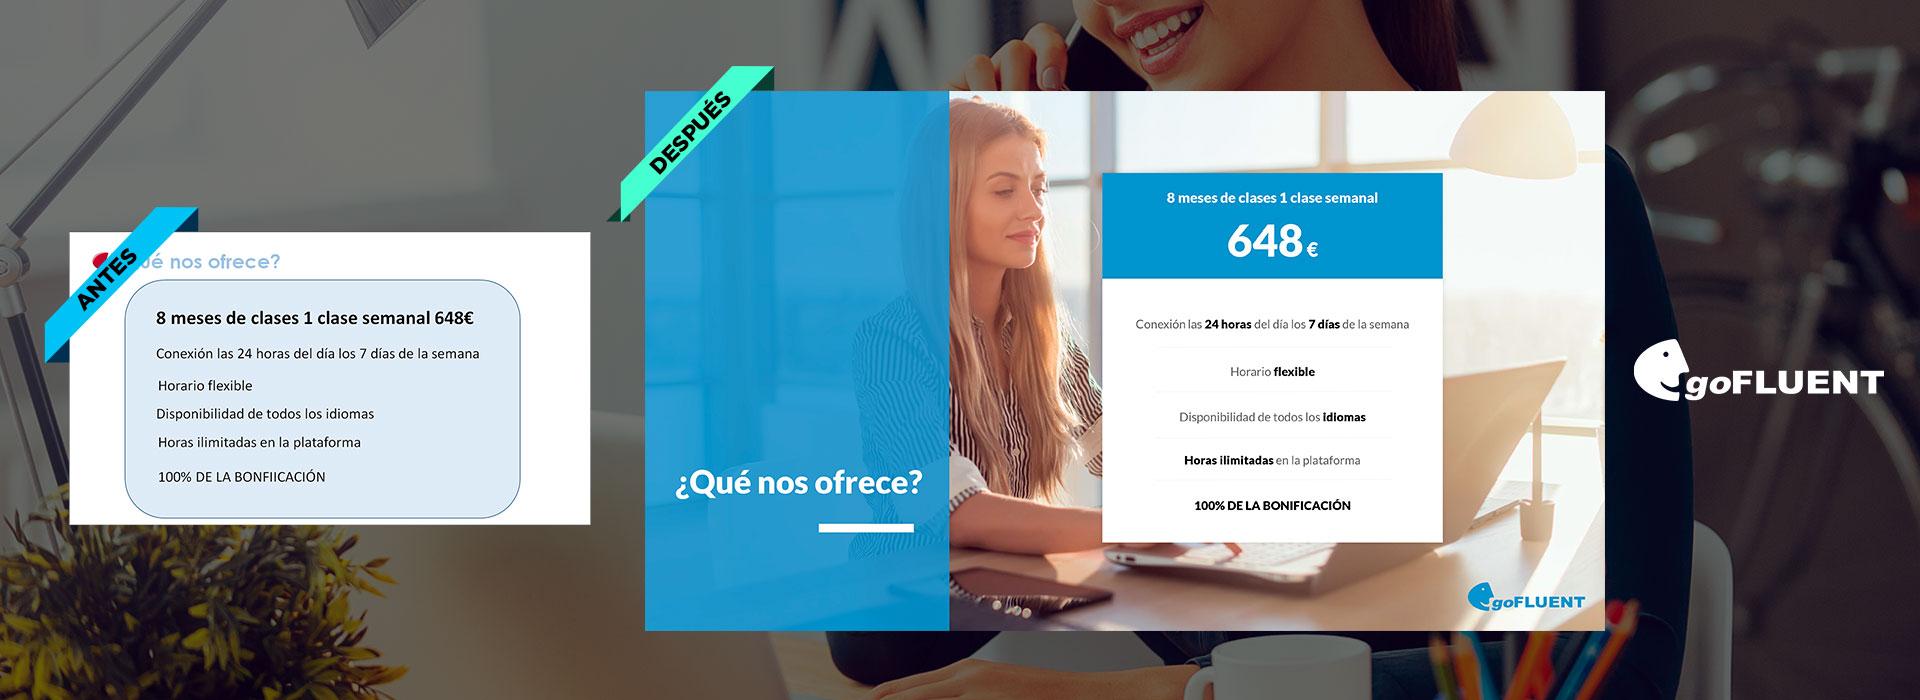 cabecera-presentacion-plataforma-de-idiomas